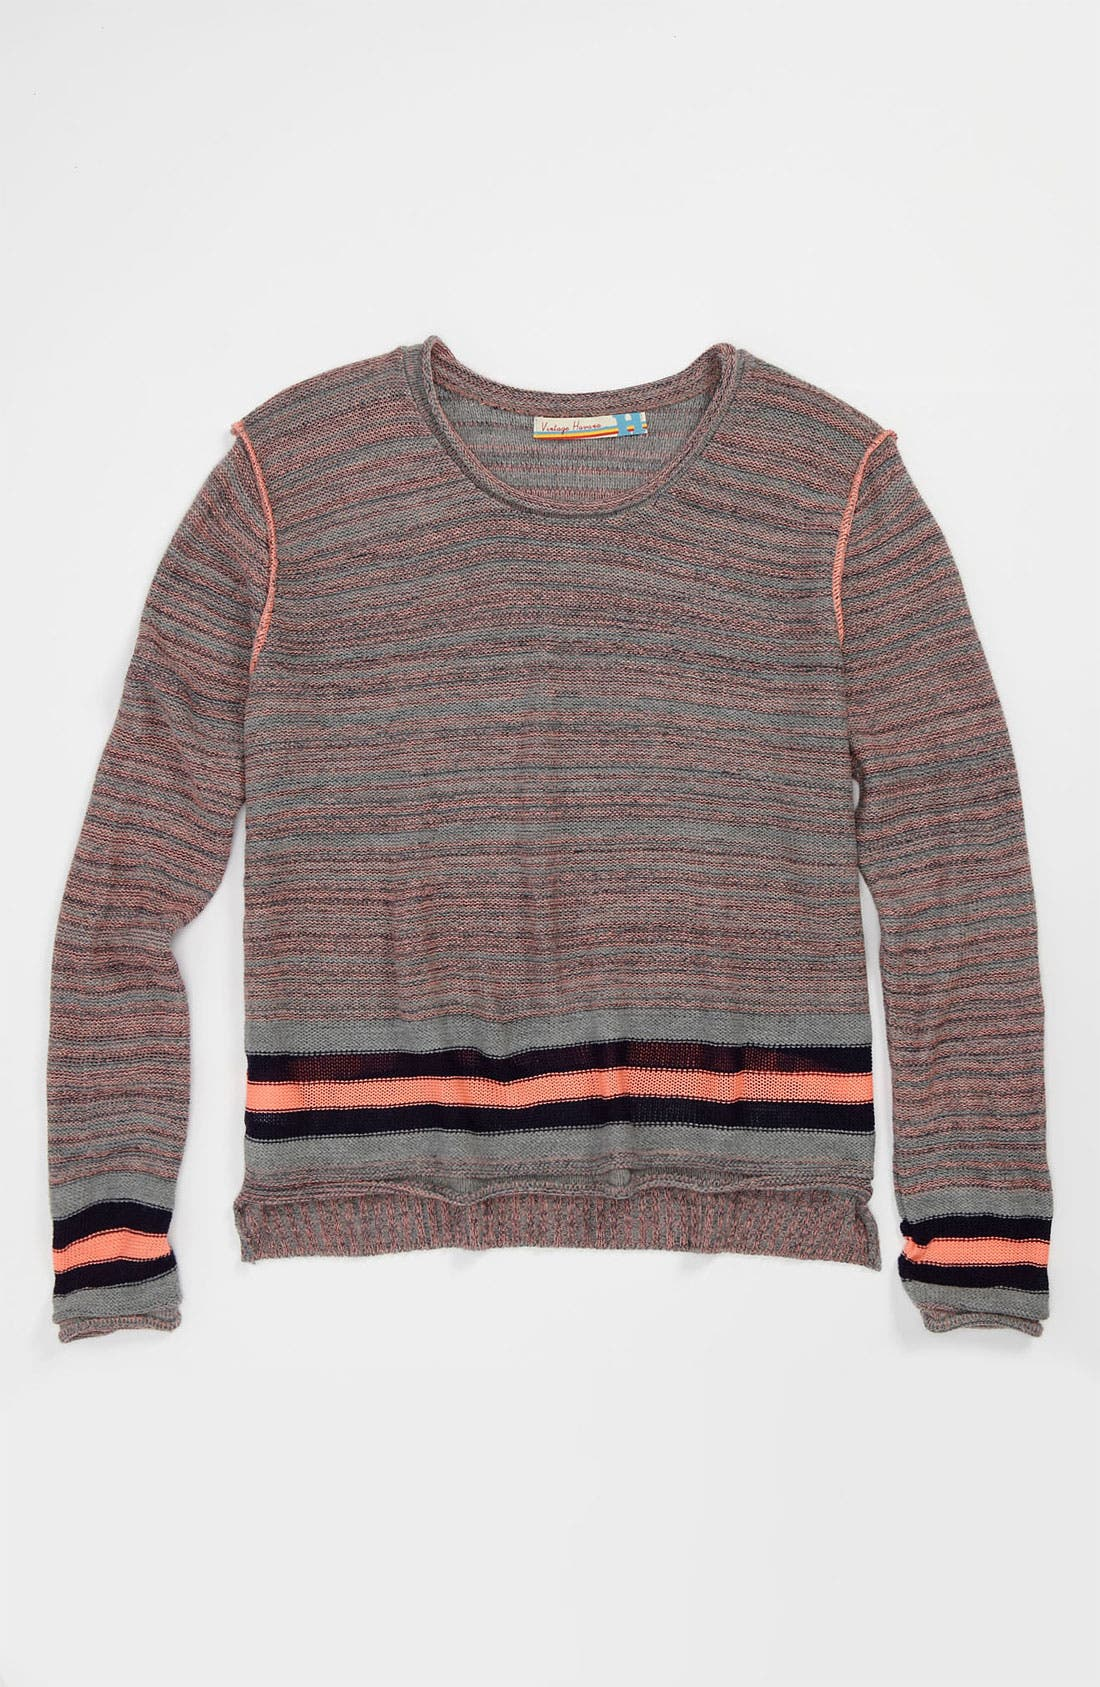 Alternate Image 1 Selected - Vintage Havana Sweater (Big Girls)